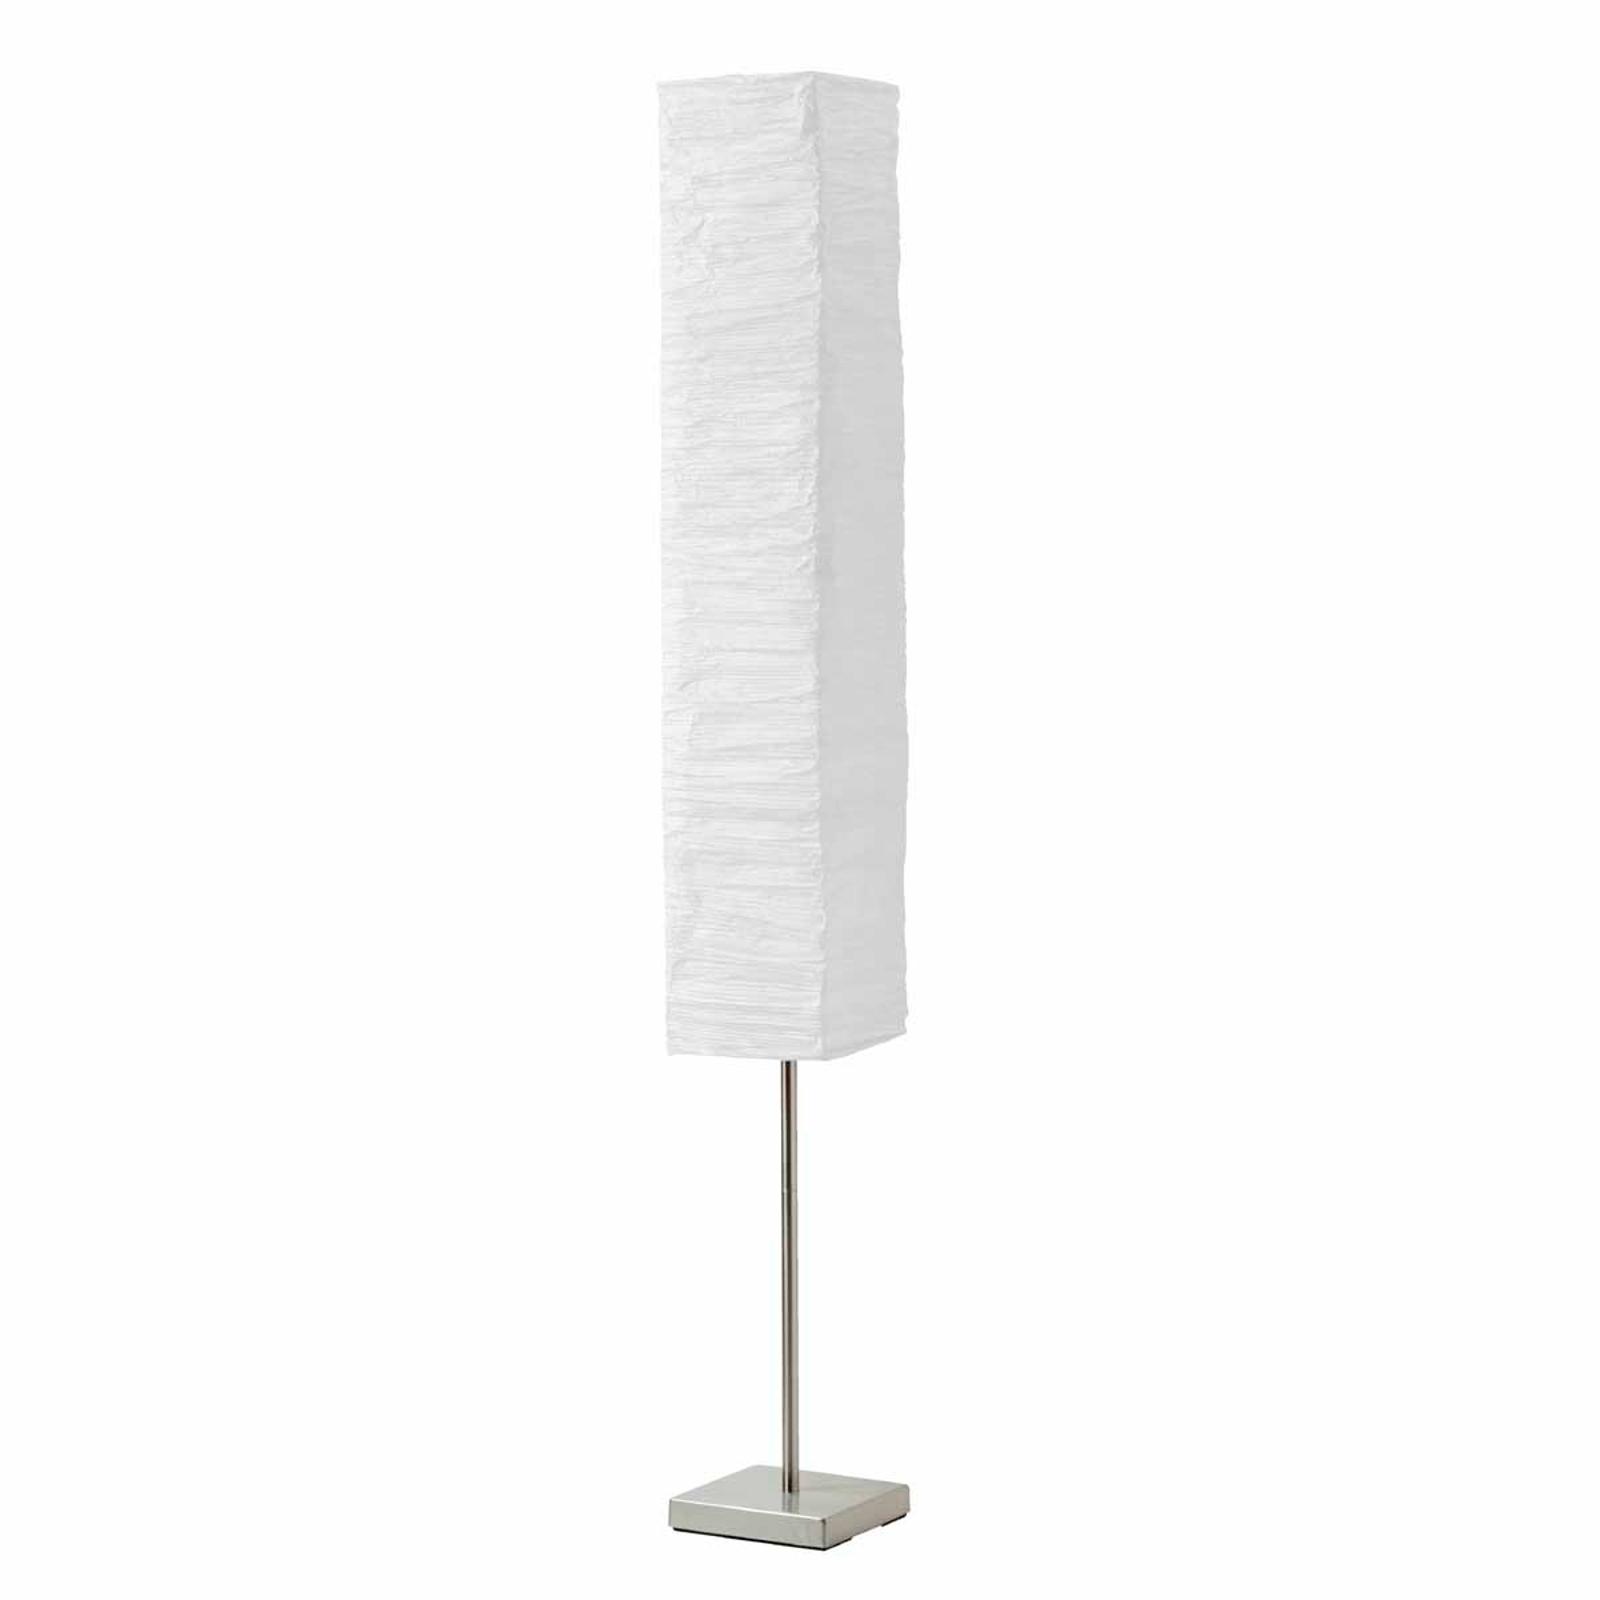 Poliedrica lampada da pavimento Nerva bianco